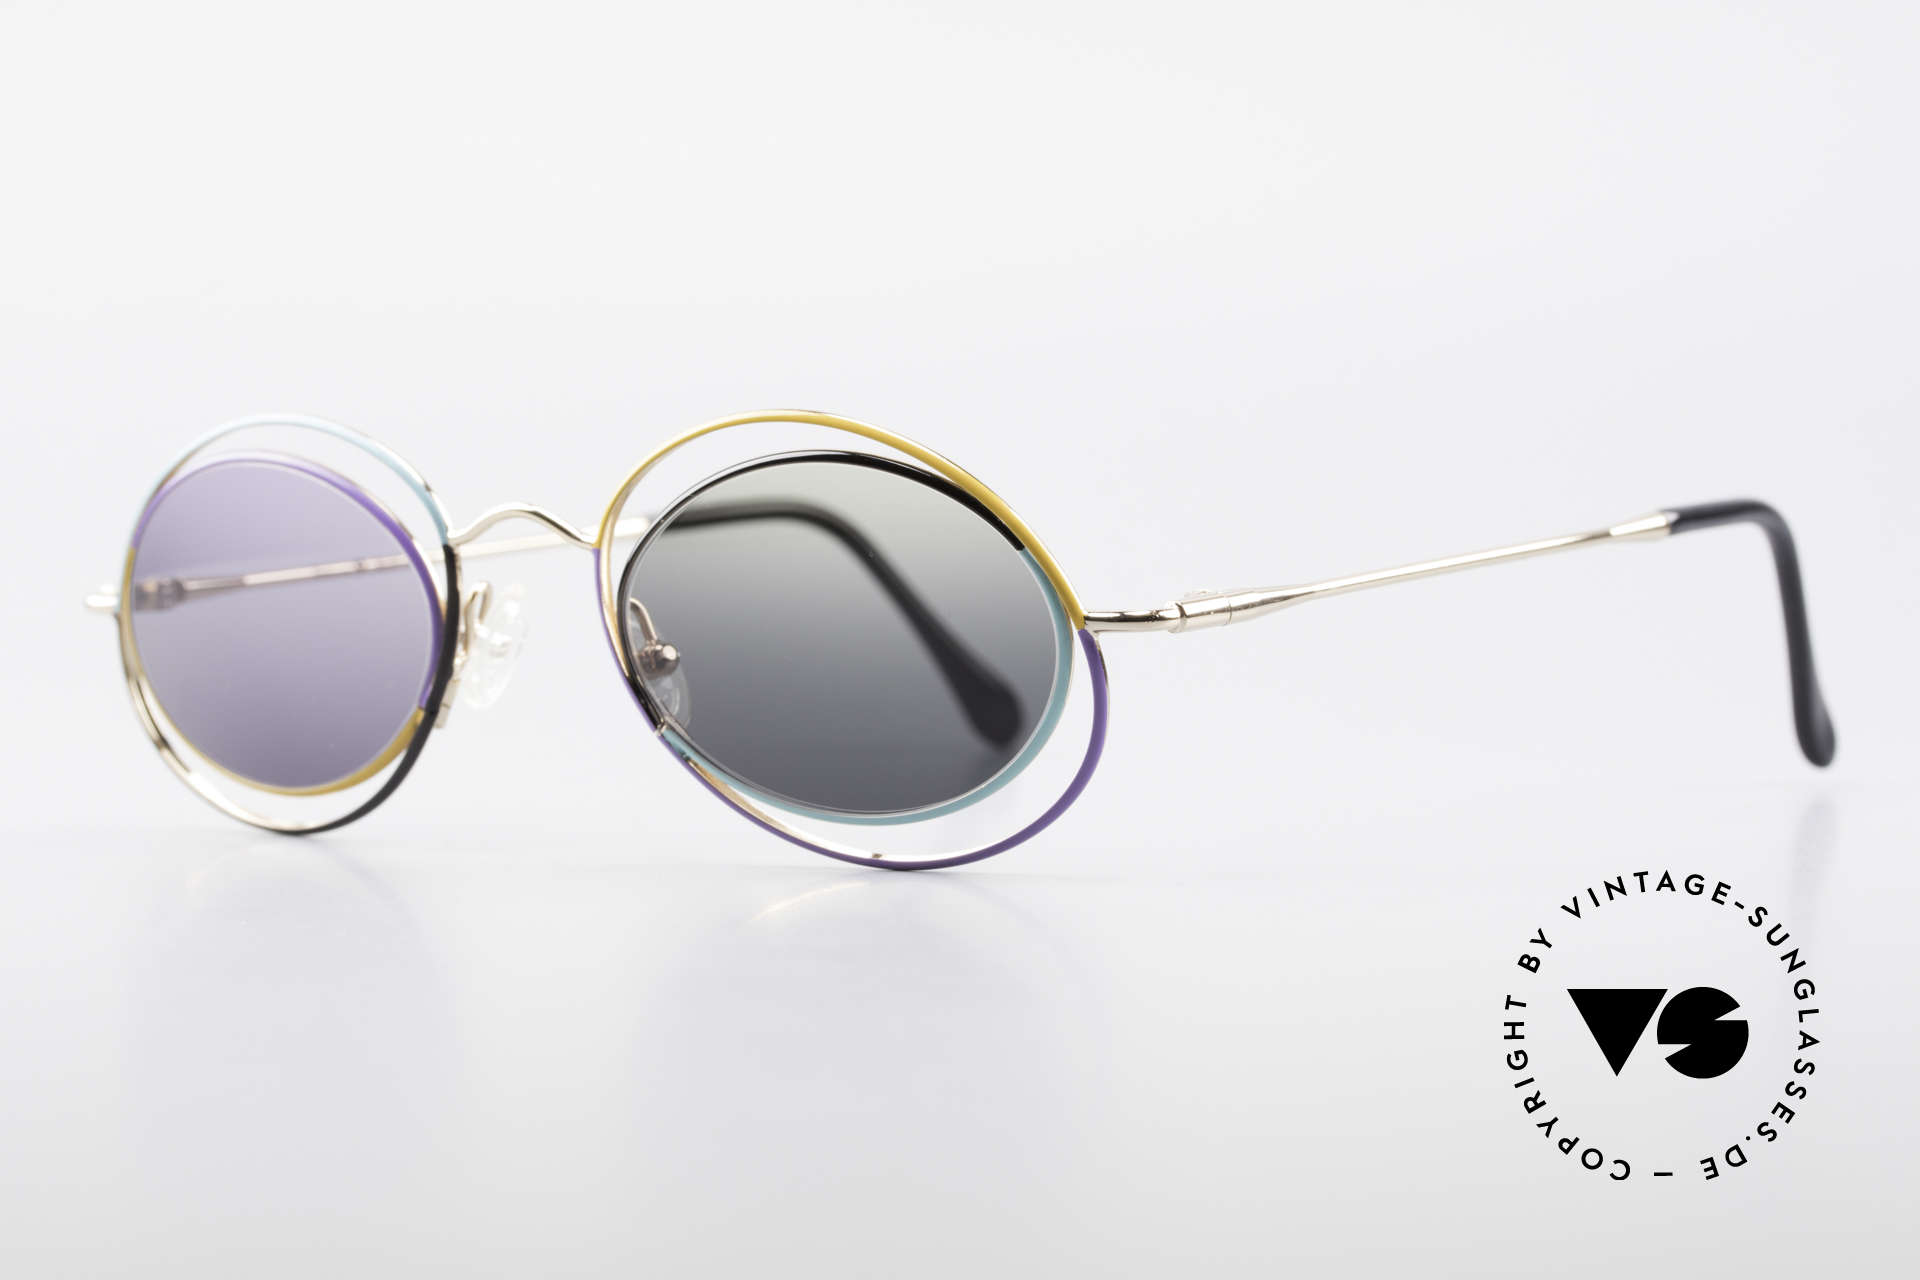 Casanova LC18 Vintage Art Sunglasses 80's, artful, imaginative, colorful, functional, different, Made for Women